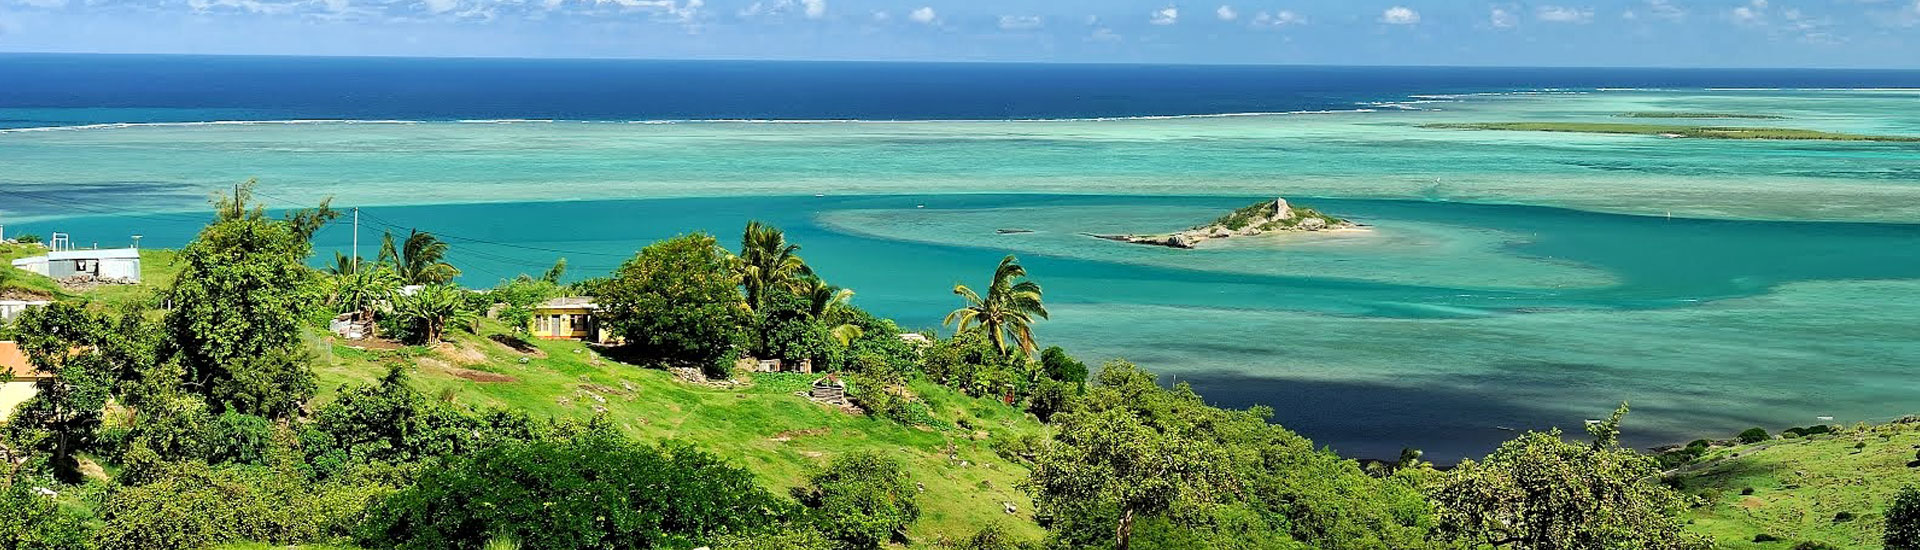 rodrigues-island-view-of-lagoon